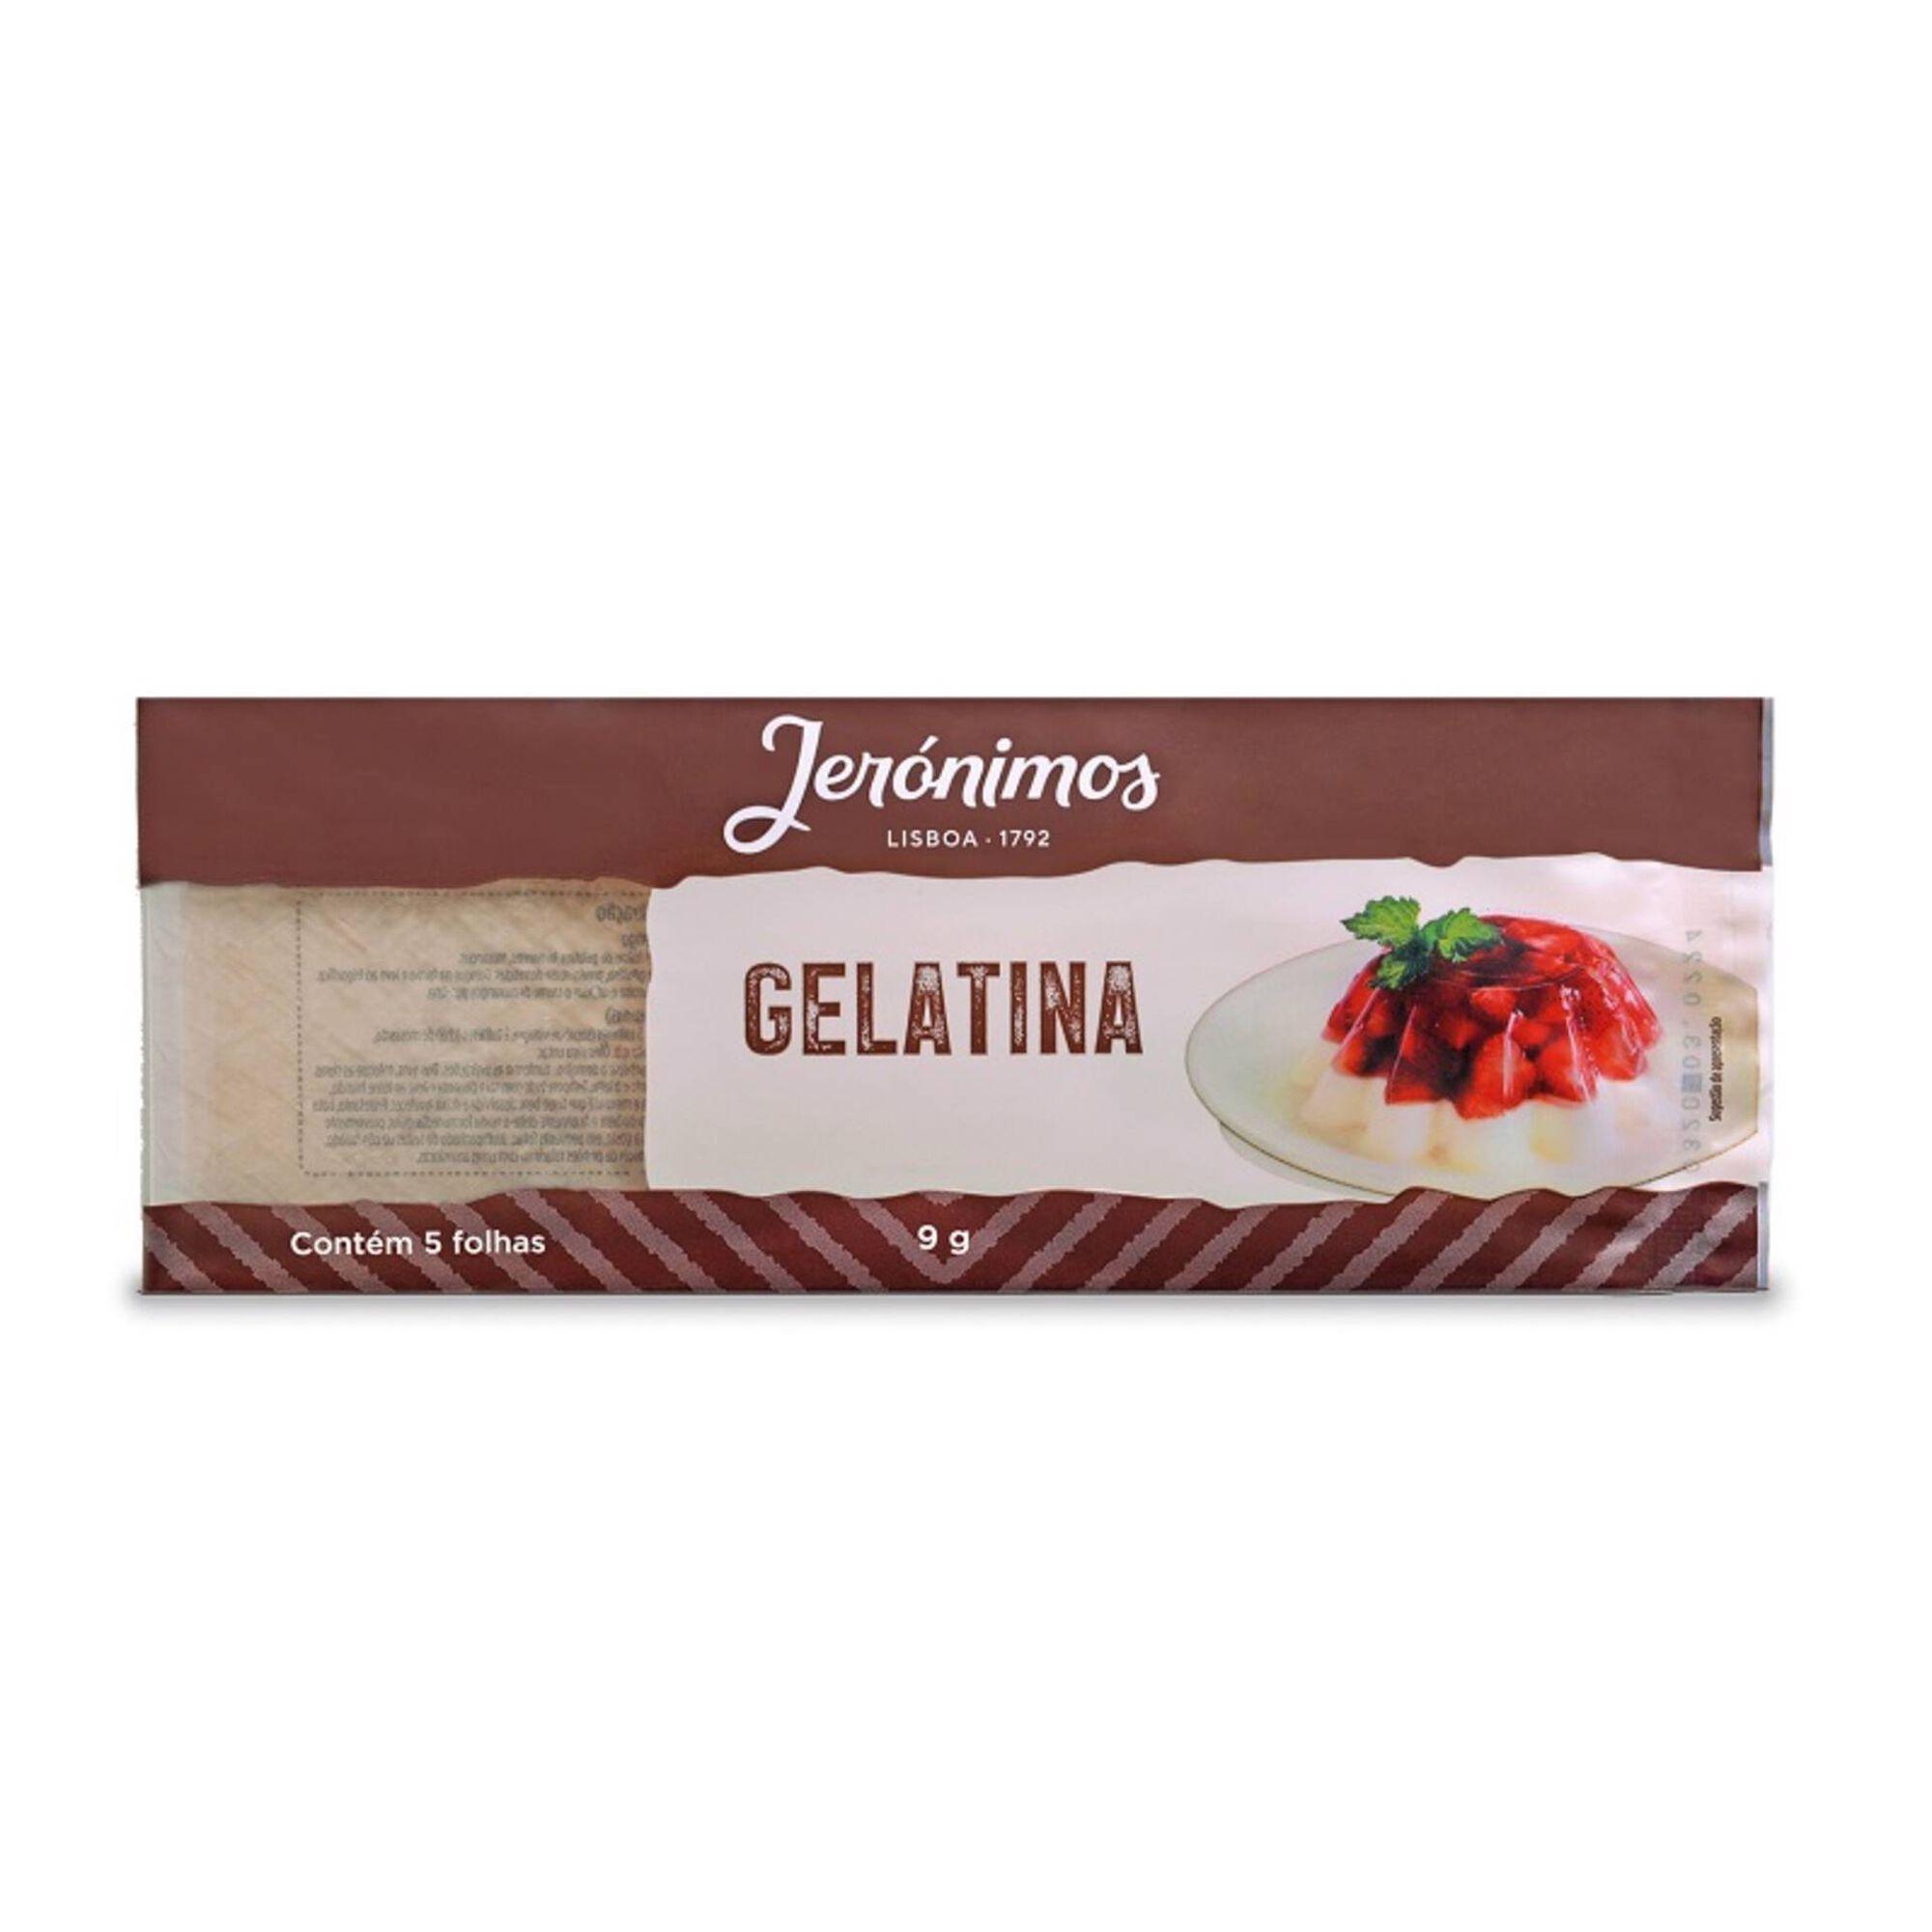 Gelatina 5 Folhas